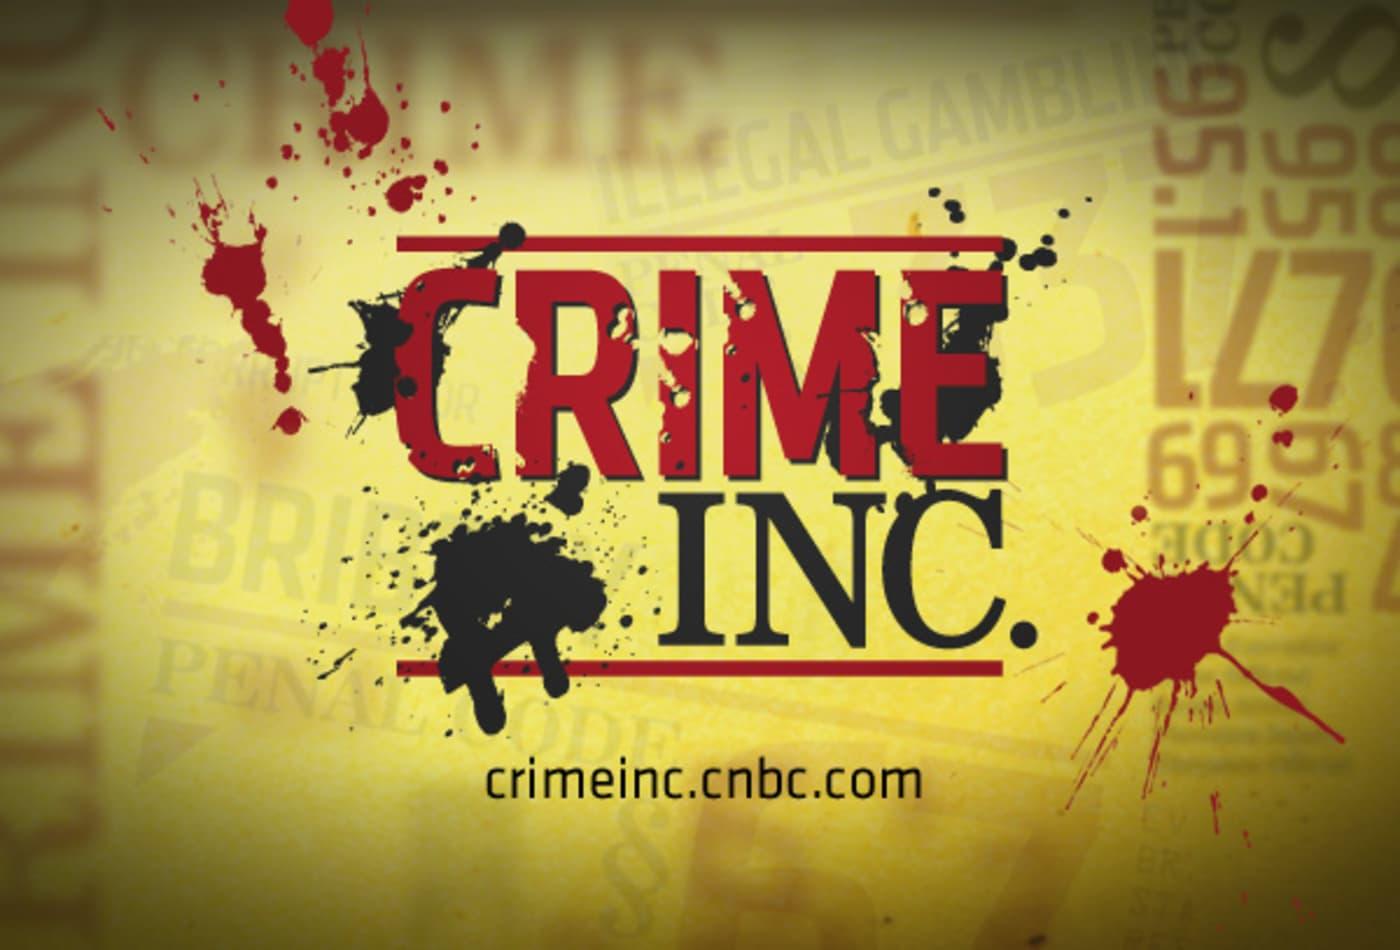 48755919 End-Crime-Inc-Most-Sought-After-Trade-Secrets.jpg